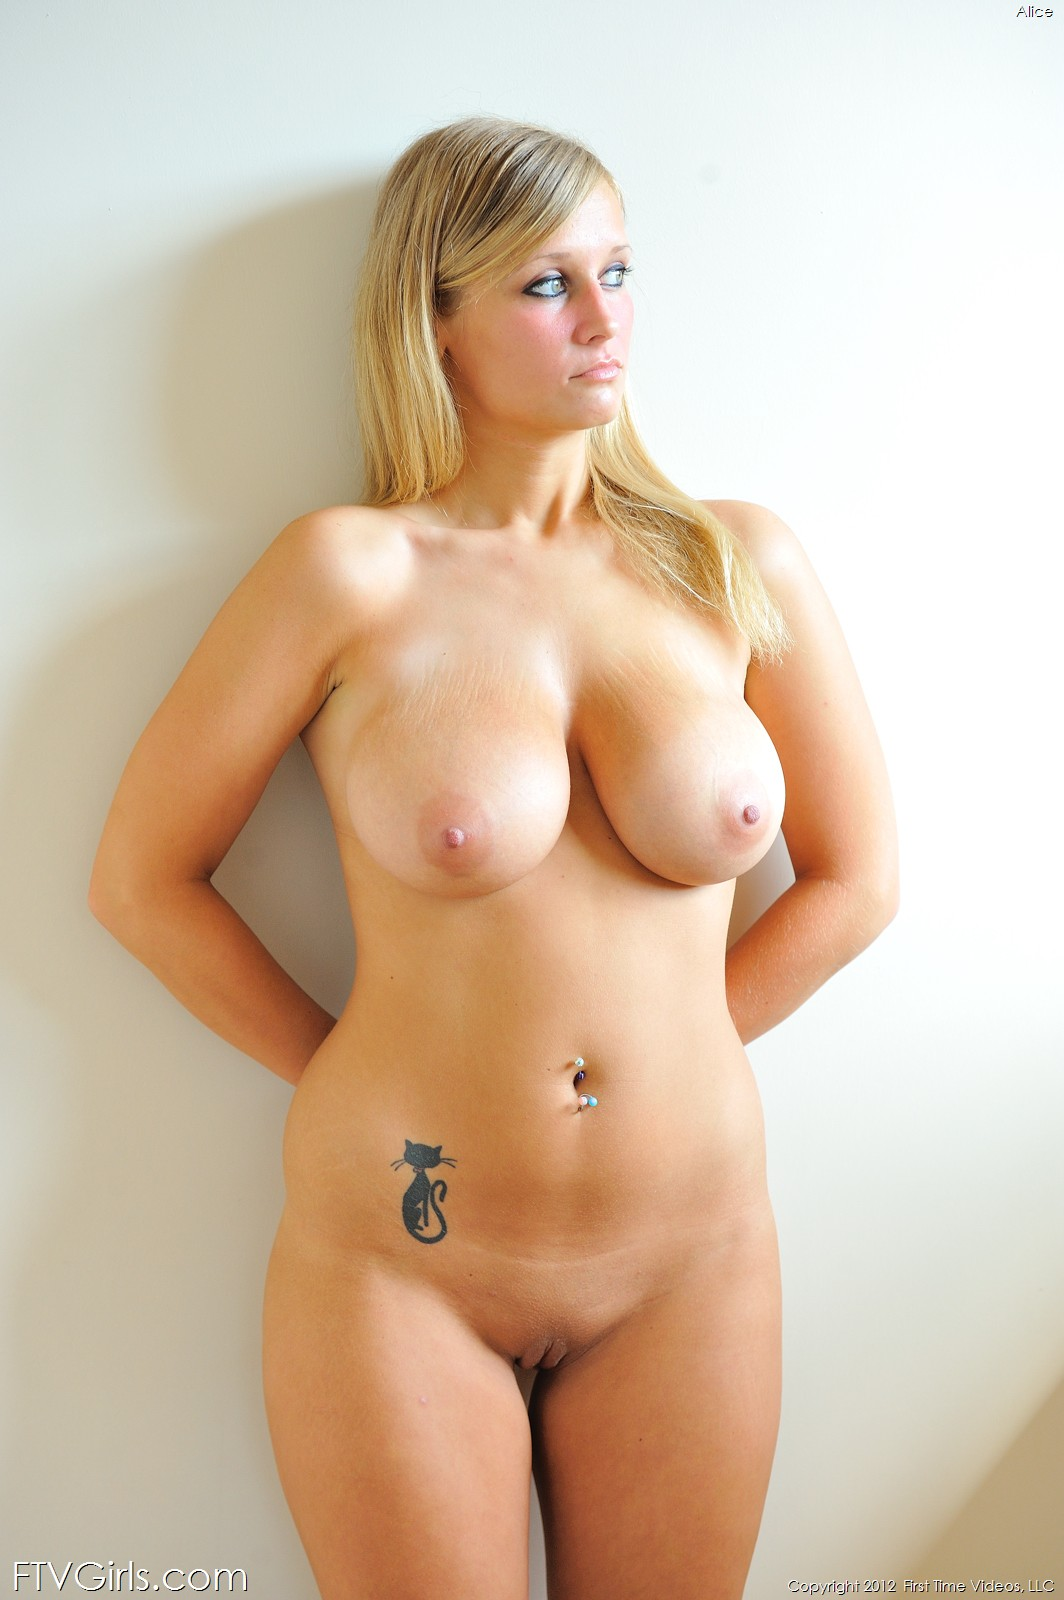 girl getting fucked by a baseball bat porno